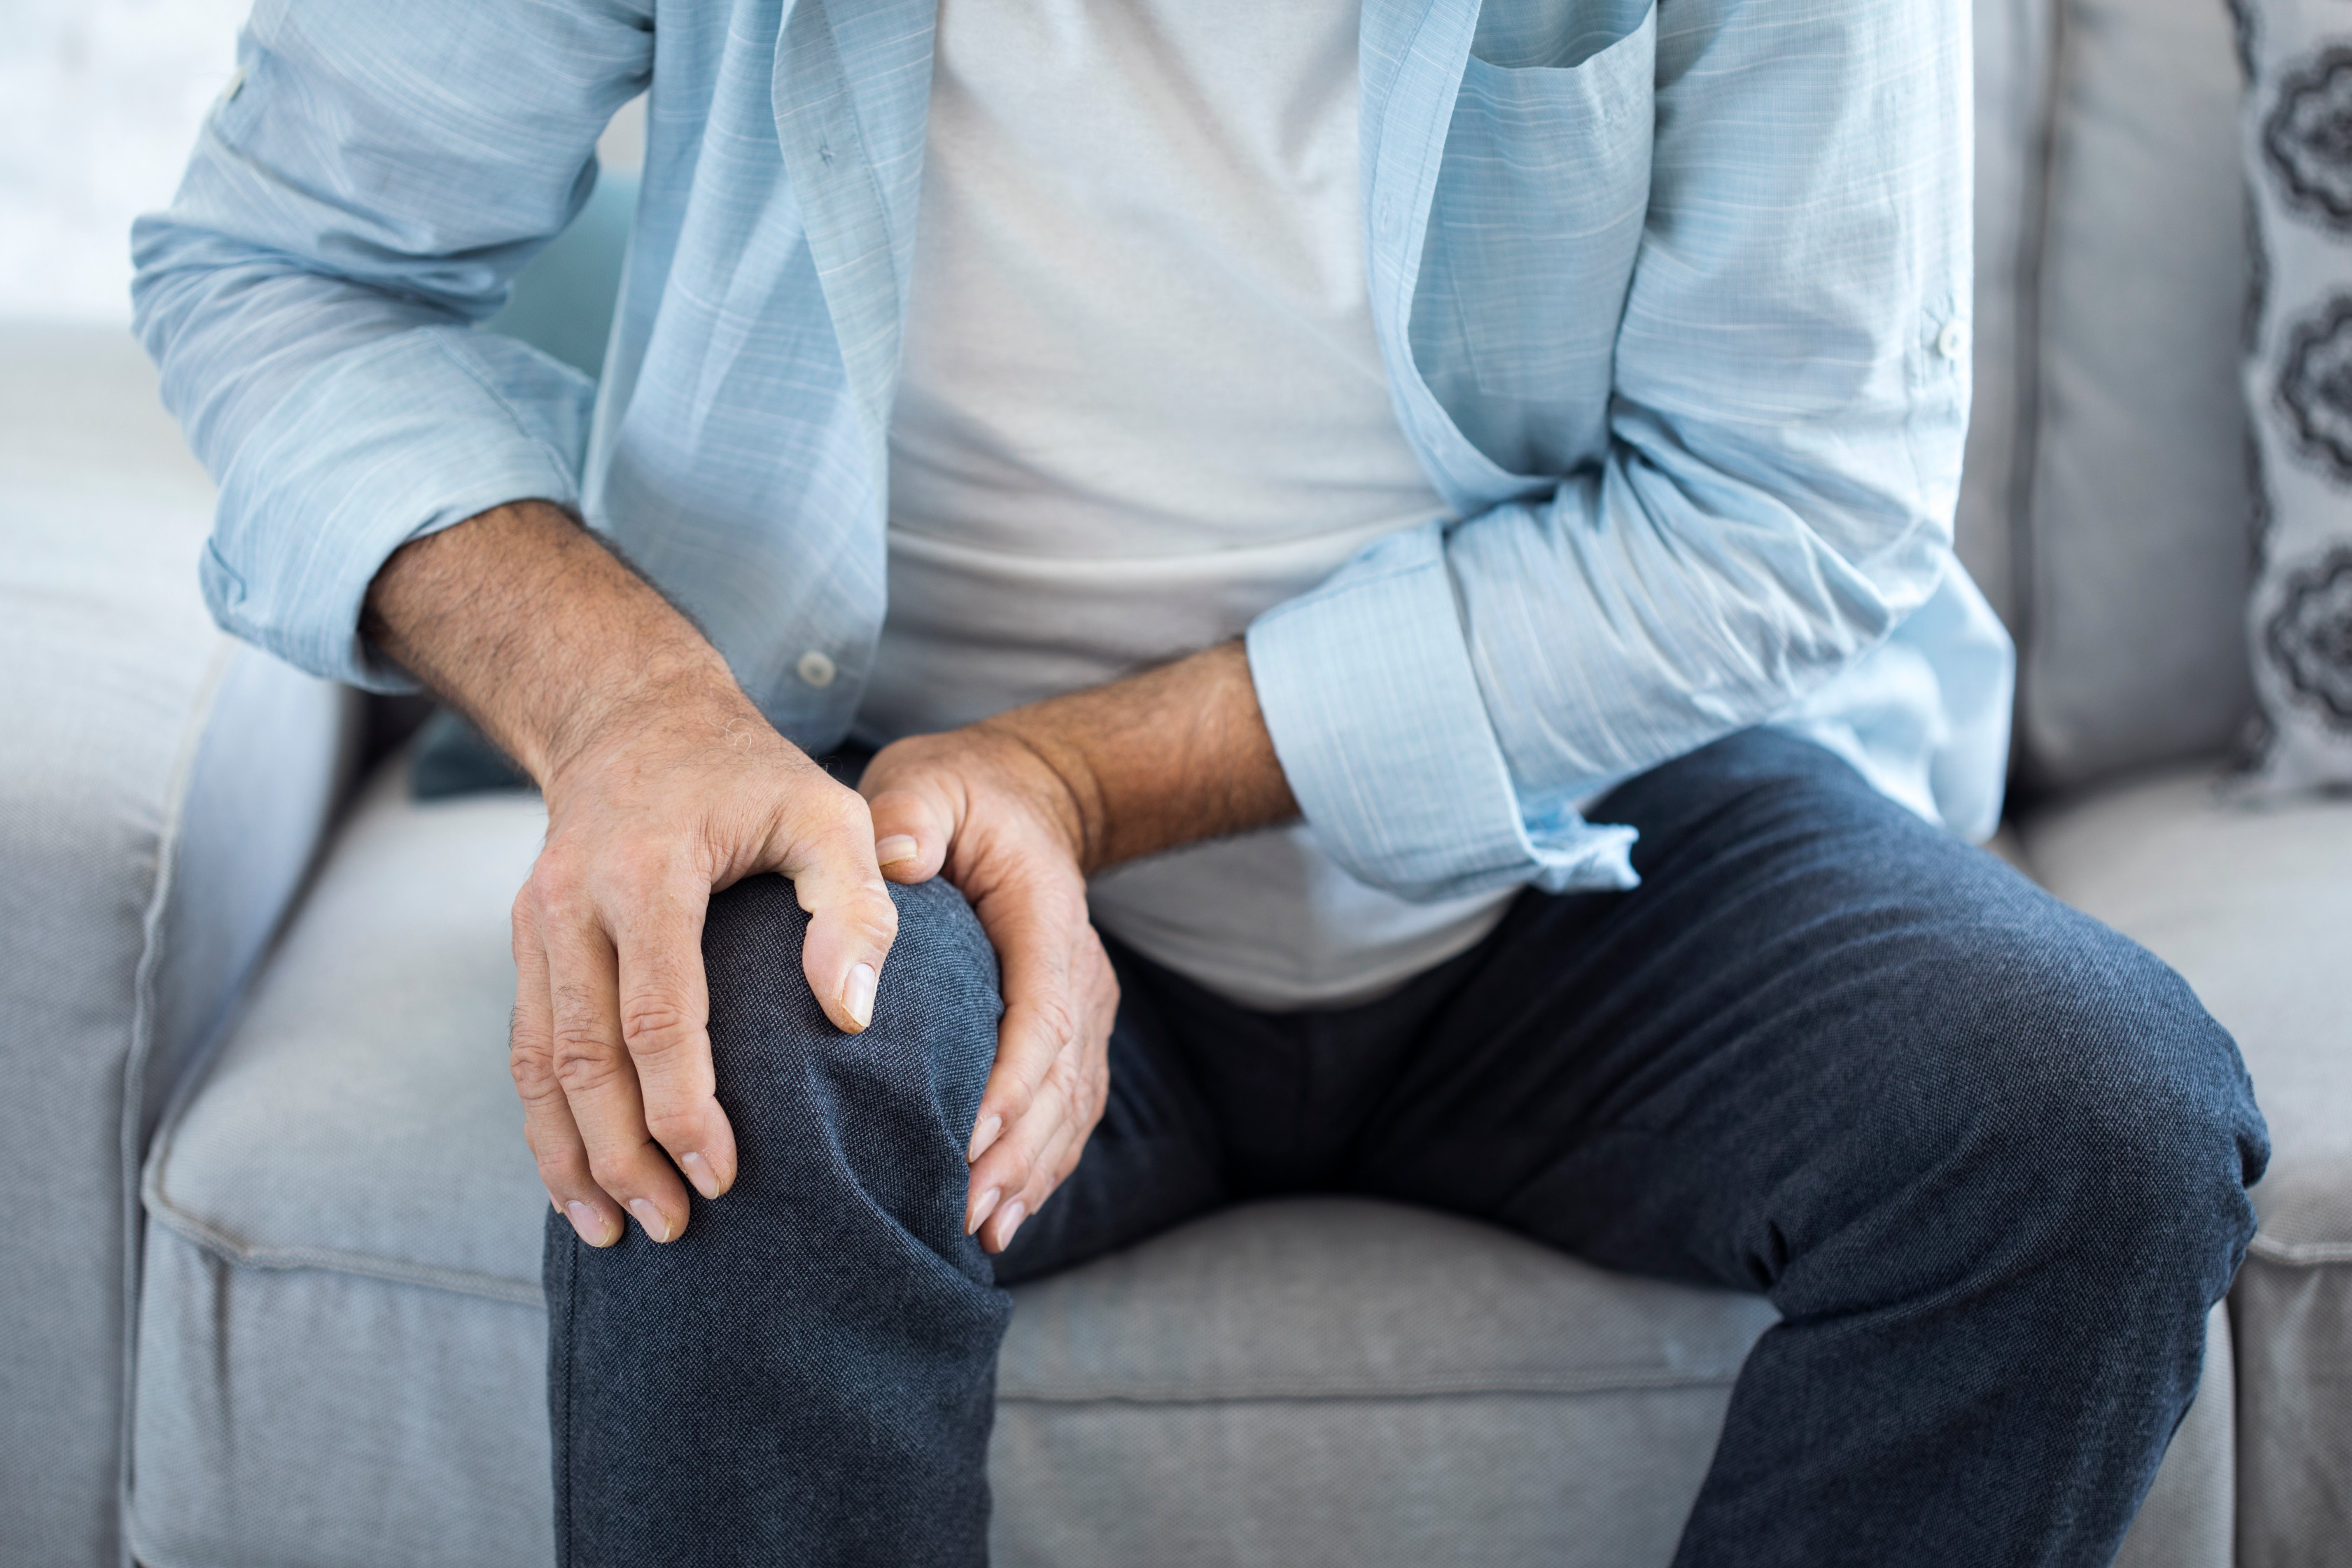 gerincfájdalom különböző ízületekben